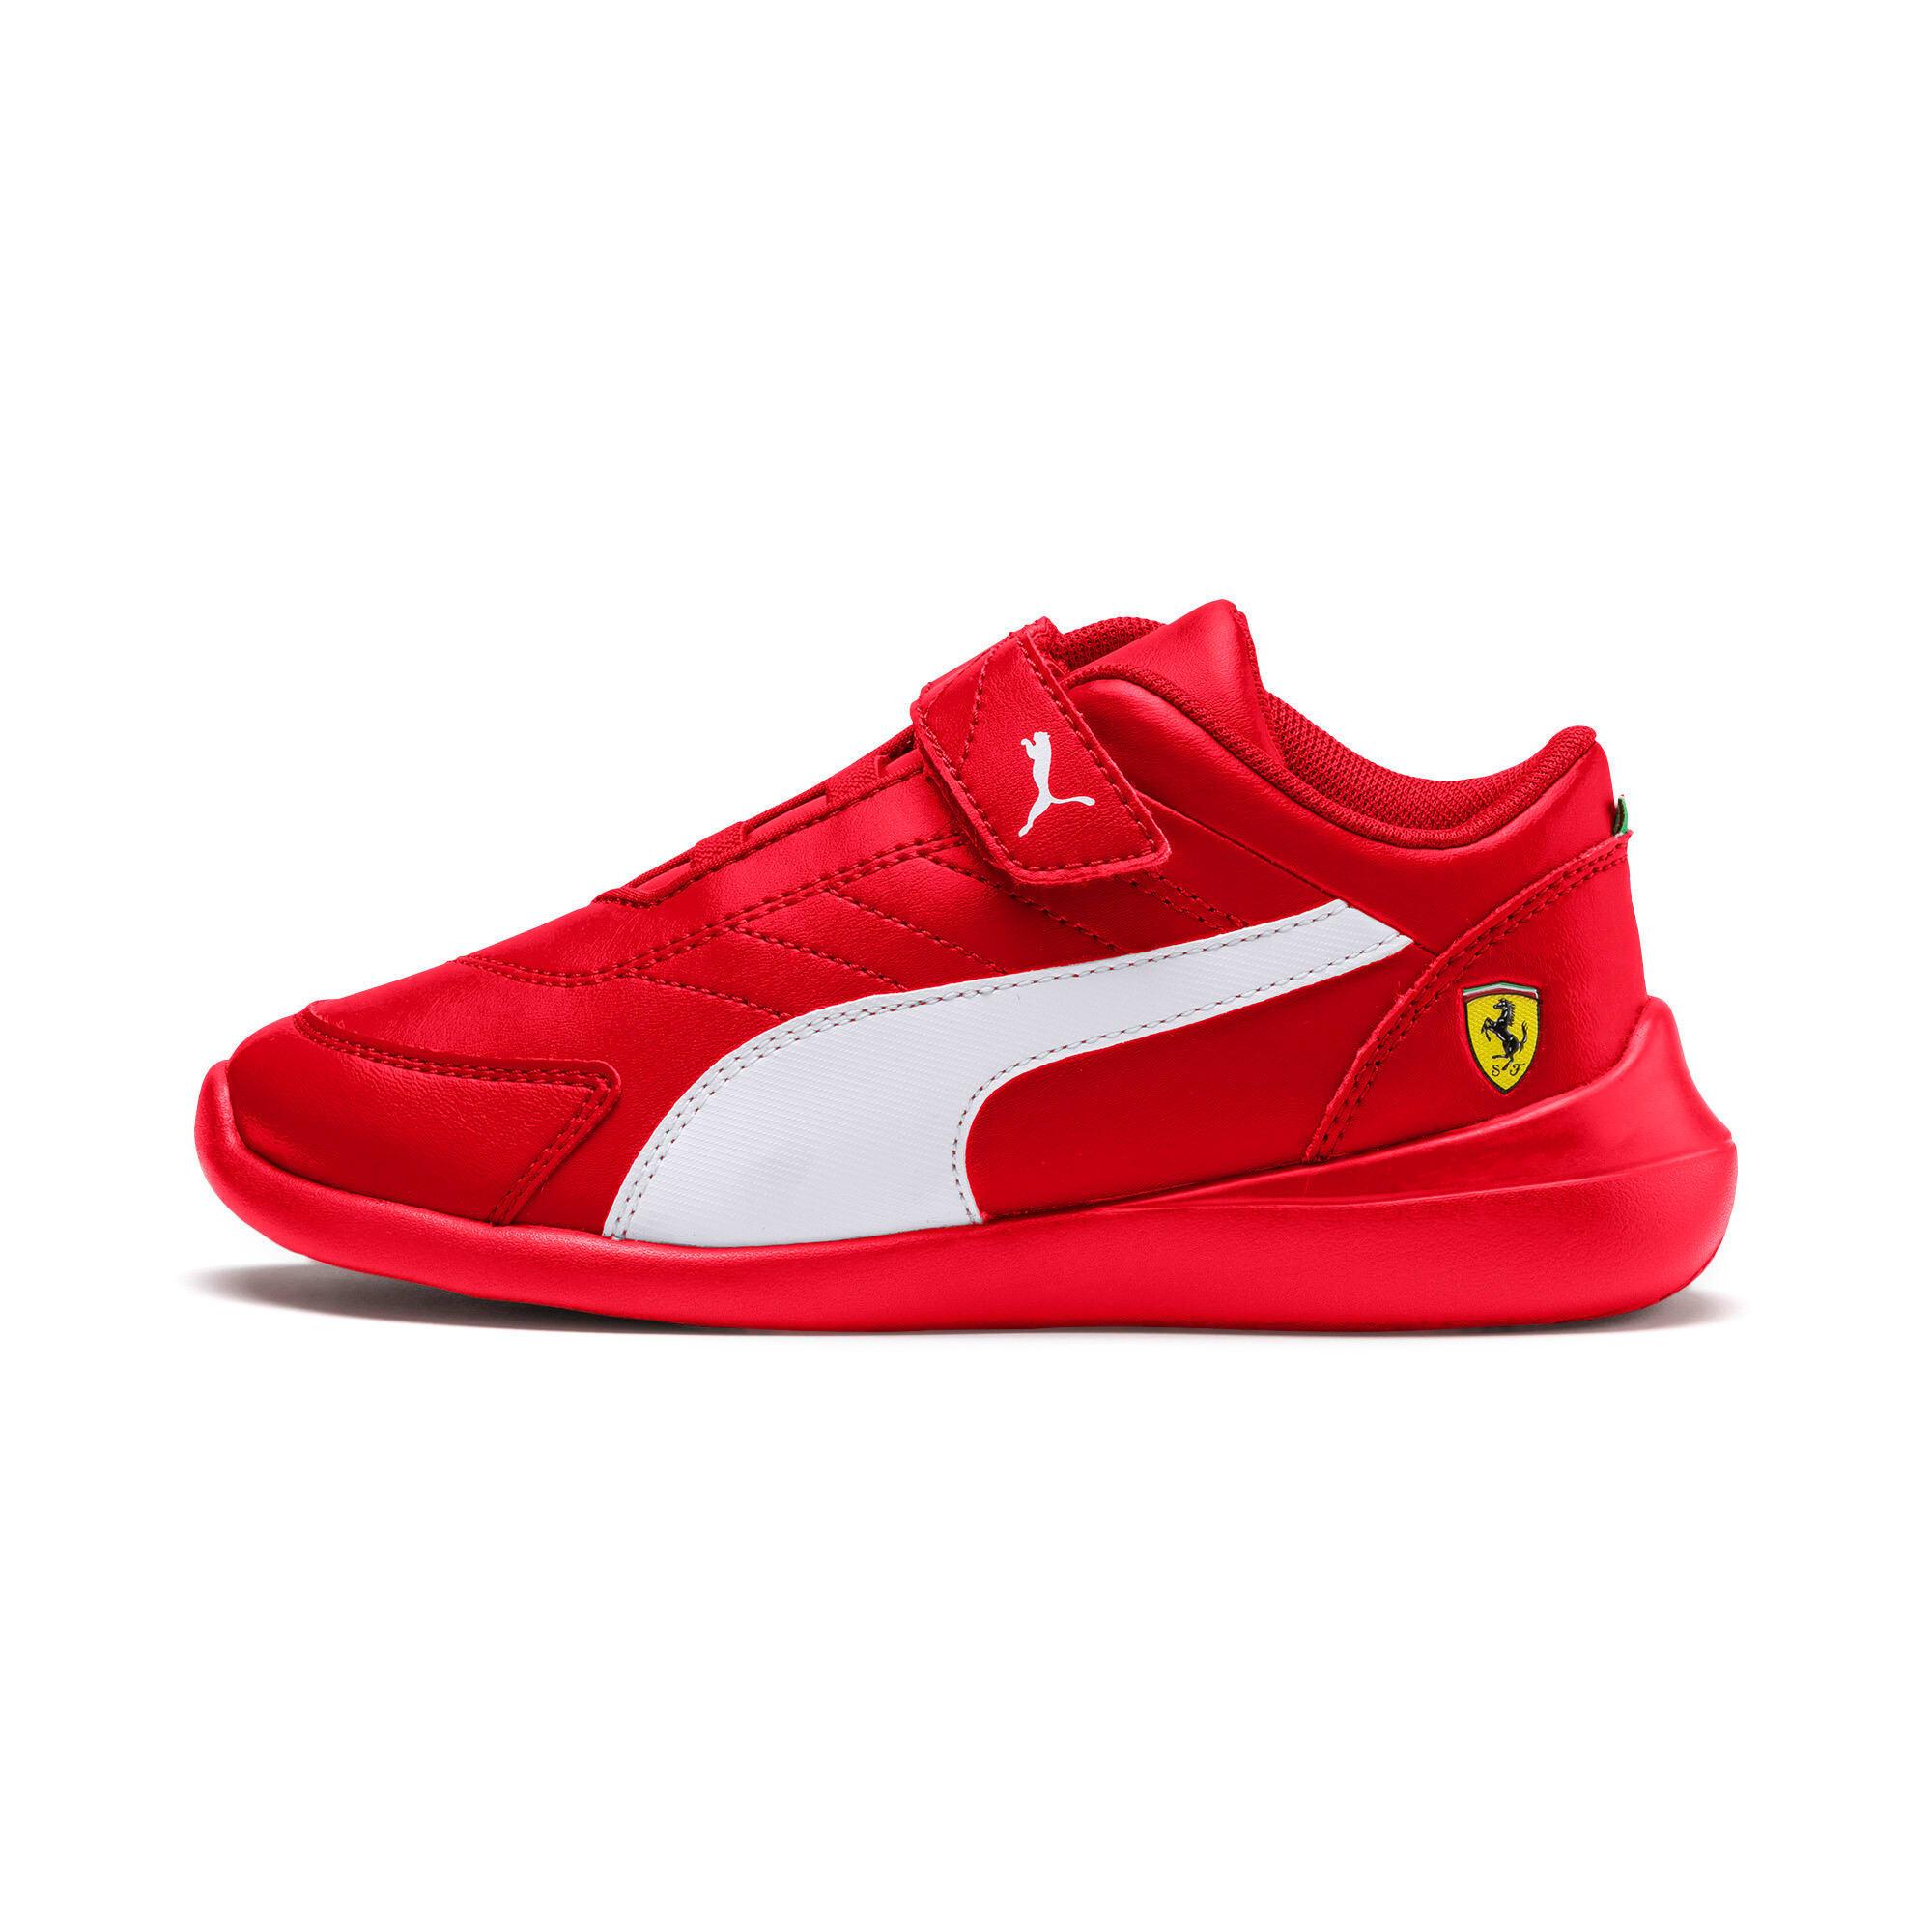 Thumbnail 1 of Ferrari Kart Cat III Kids Sneaker, Rosso Corsa-Wht-Rosso Corsa, medium